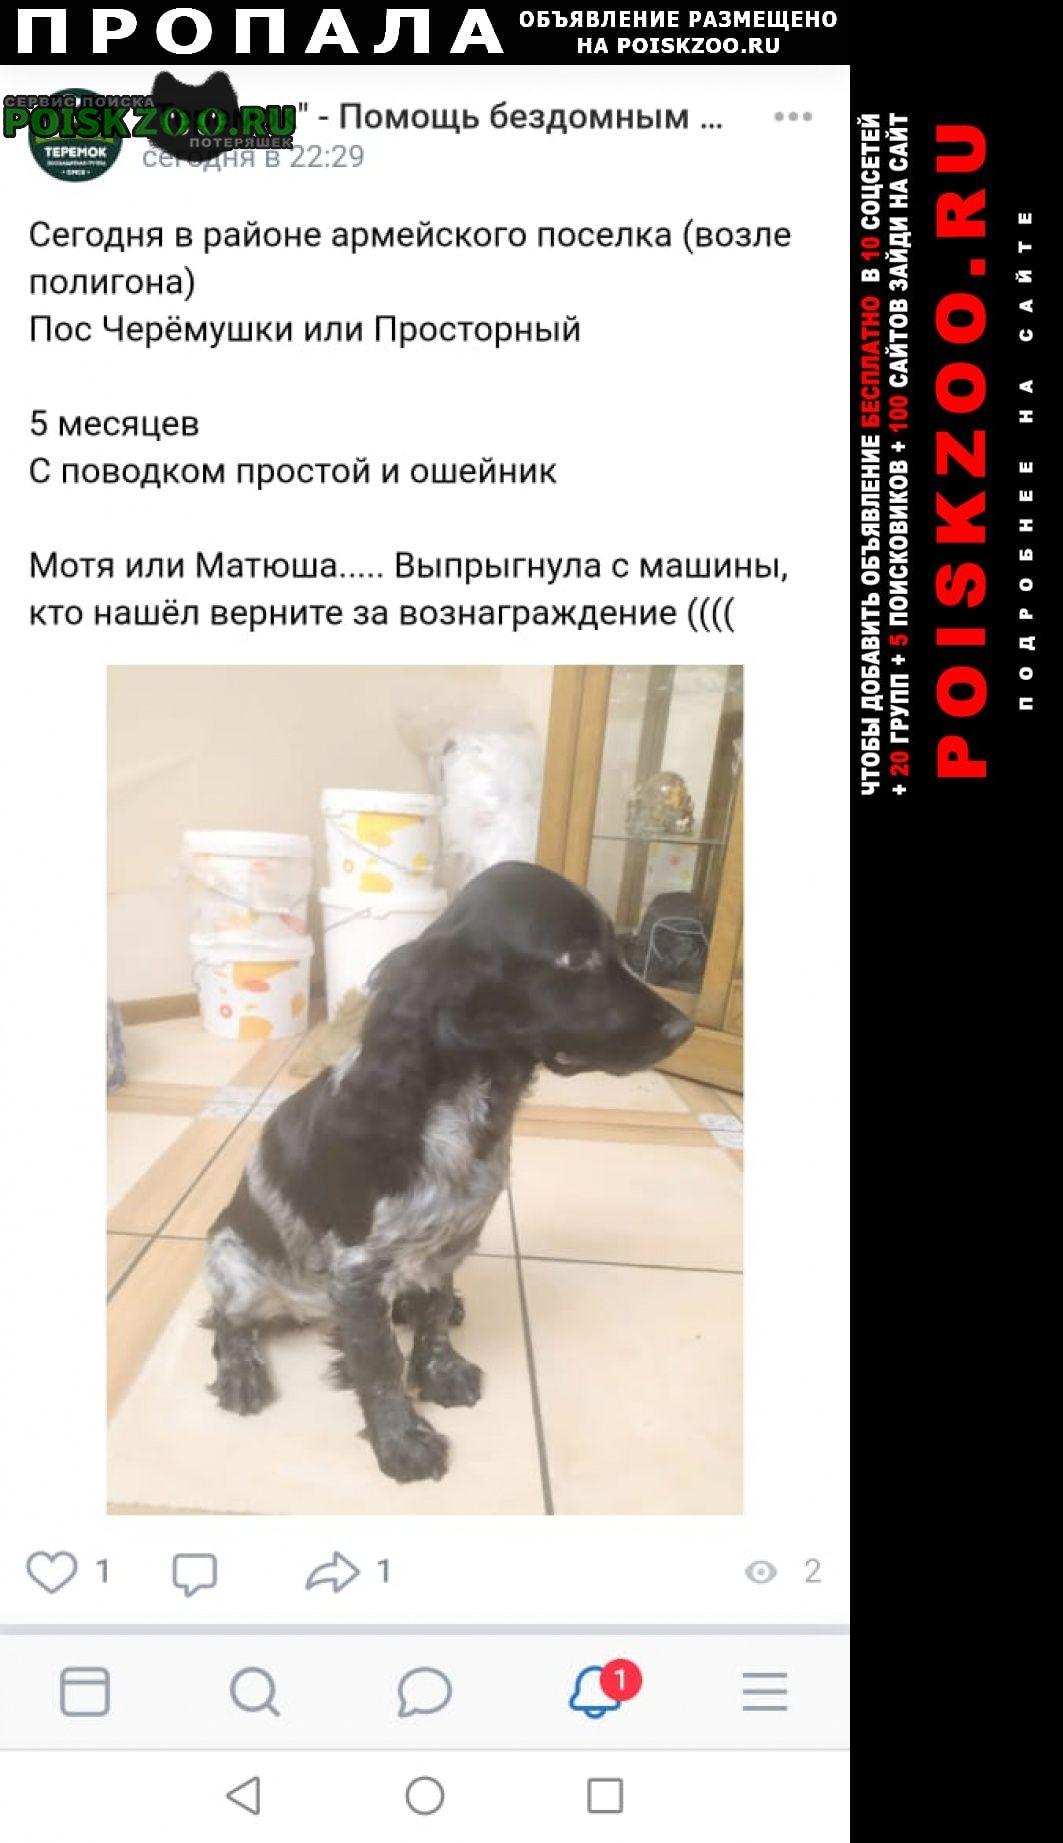 Пропала собака очень важно Омск